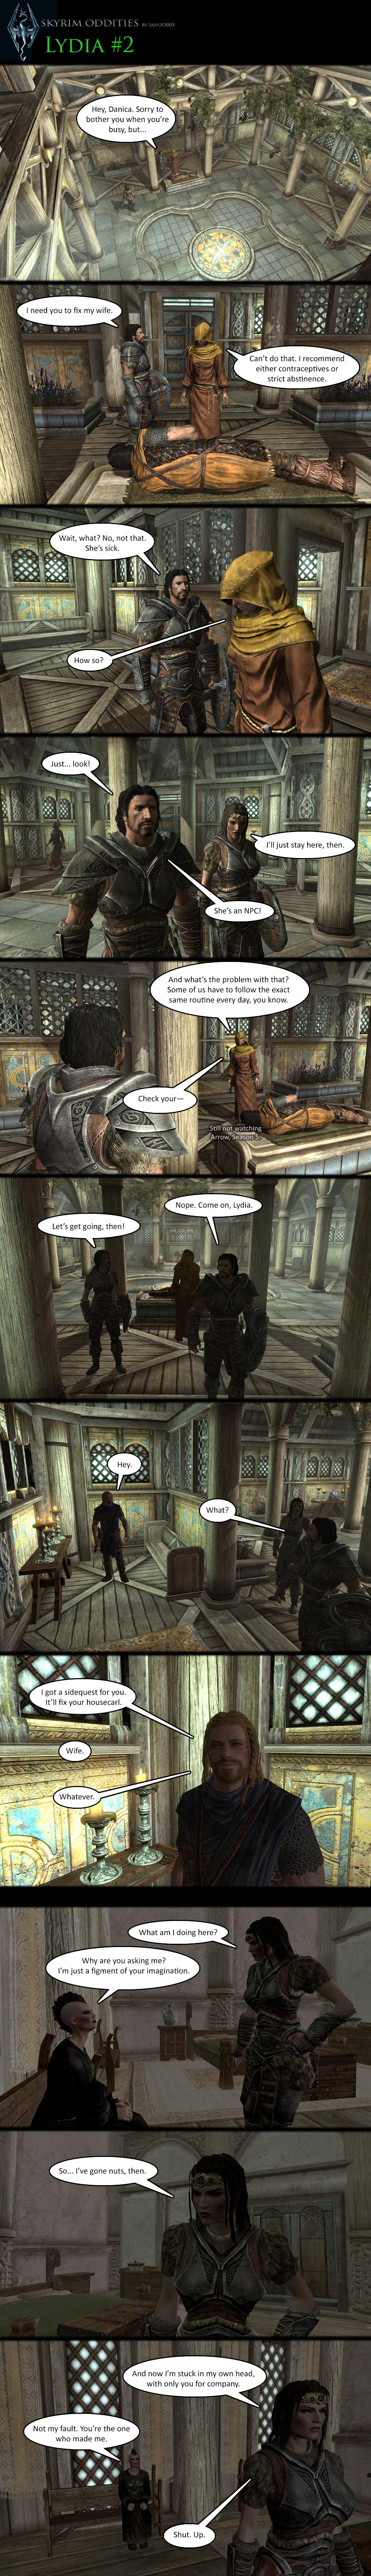 Skyrim Oddities: Lydia #2 by Janus3003 on DeviantArt